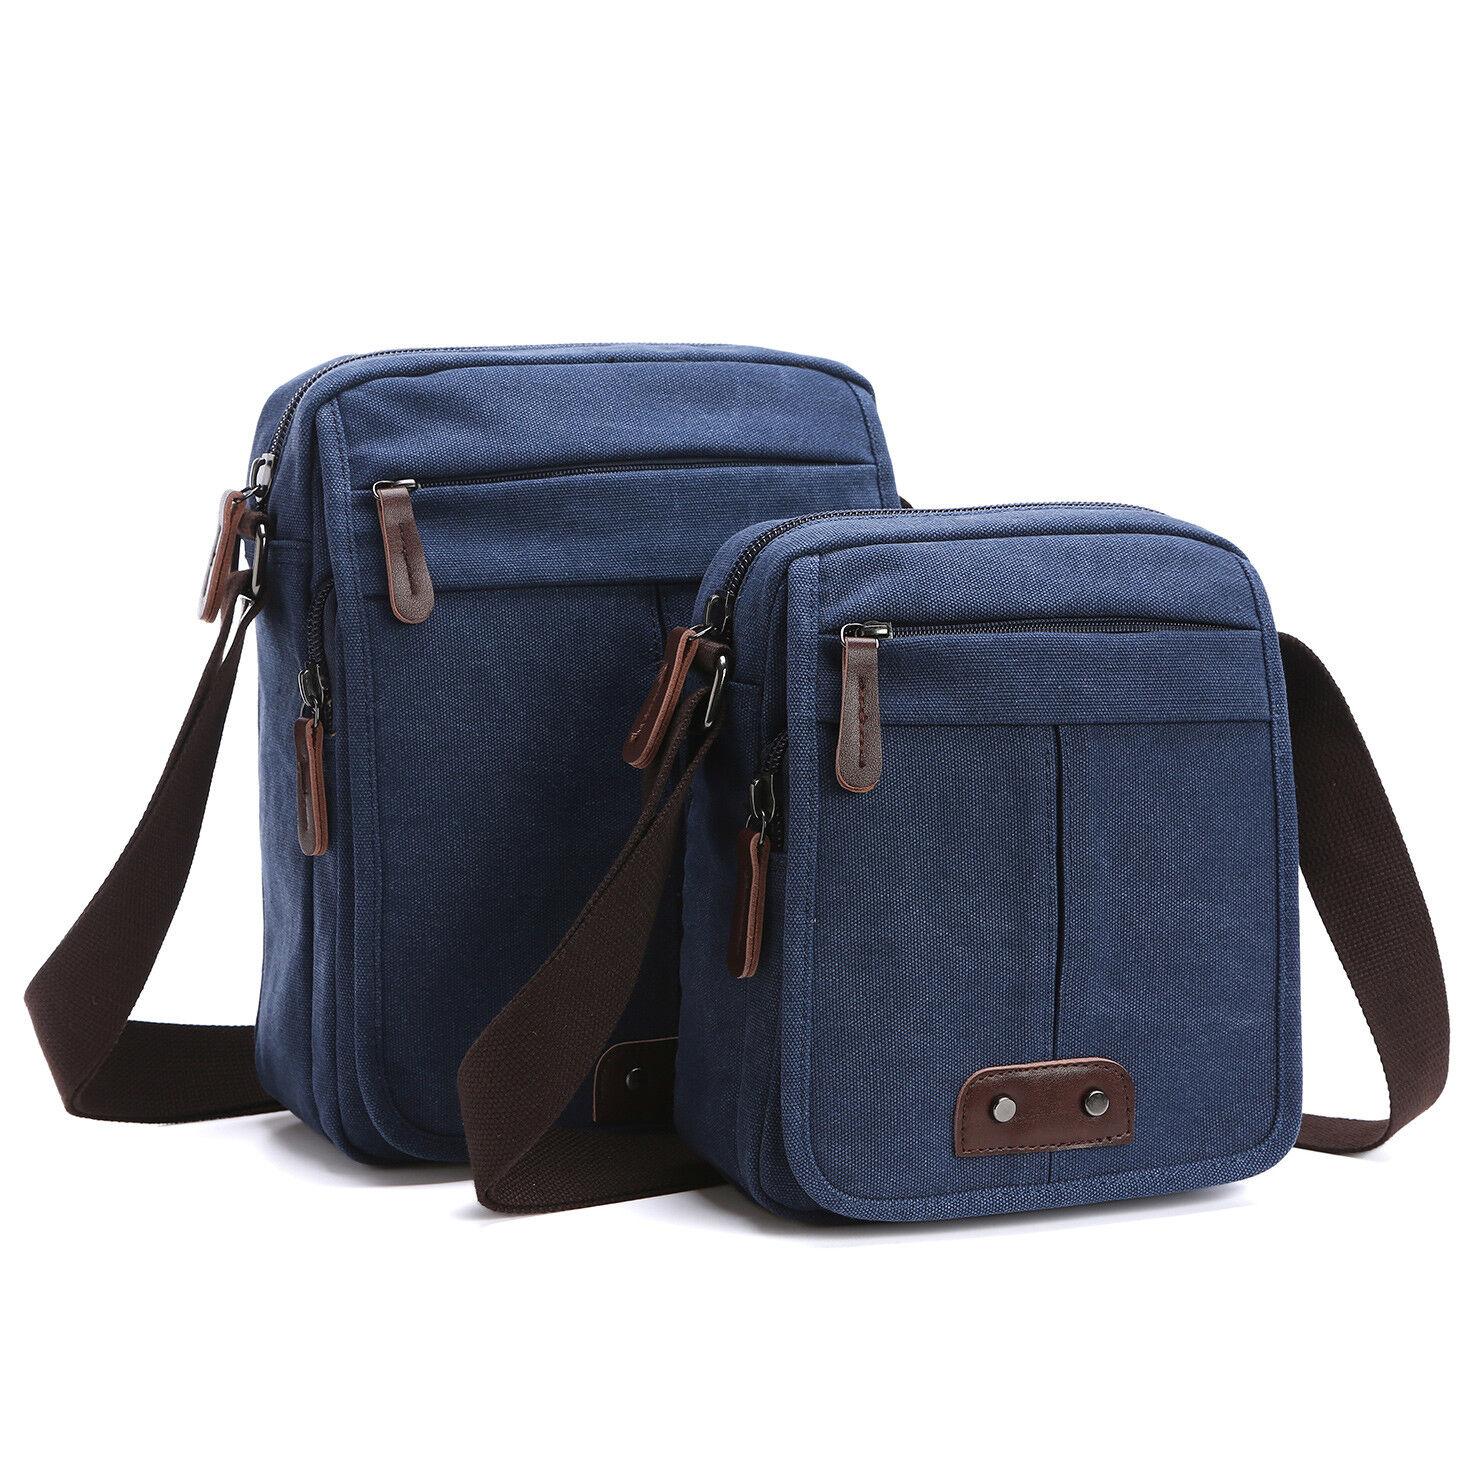 2761ae000d54 Men Canvas Shoulder Bag Vintage Military Crossbody Messenger Travel Day  Handbags фото